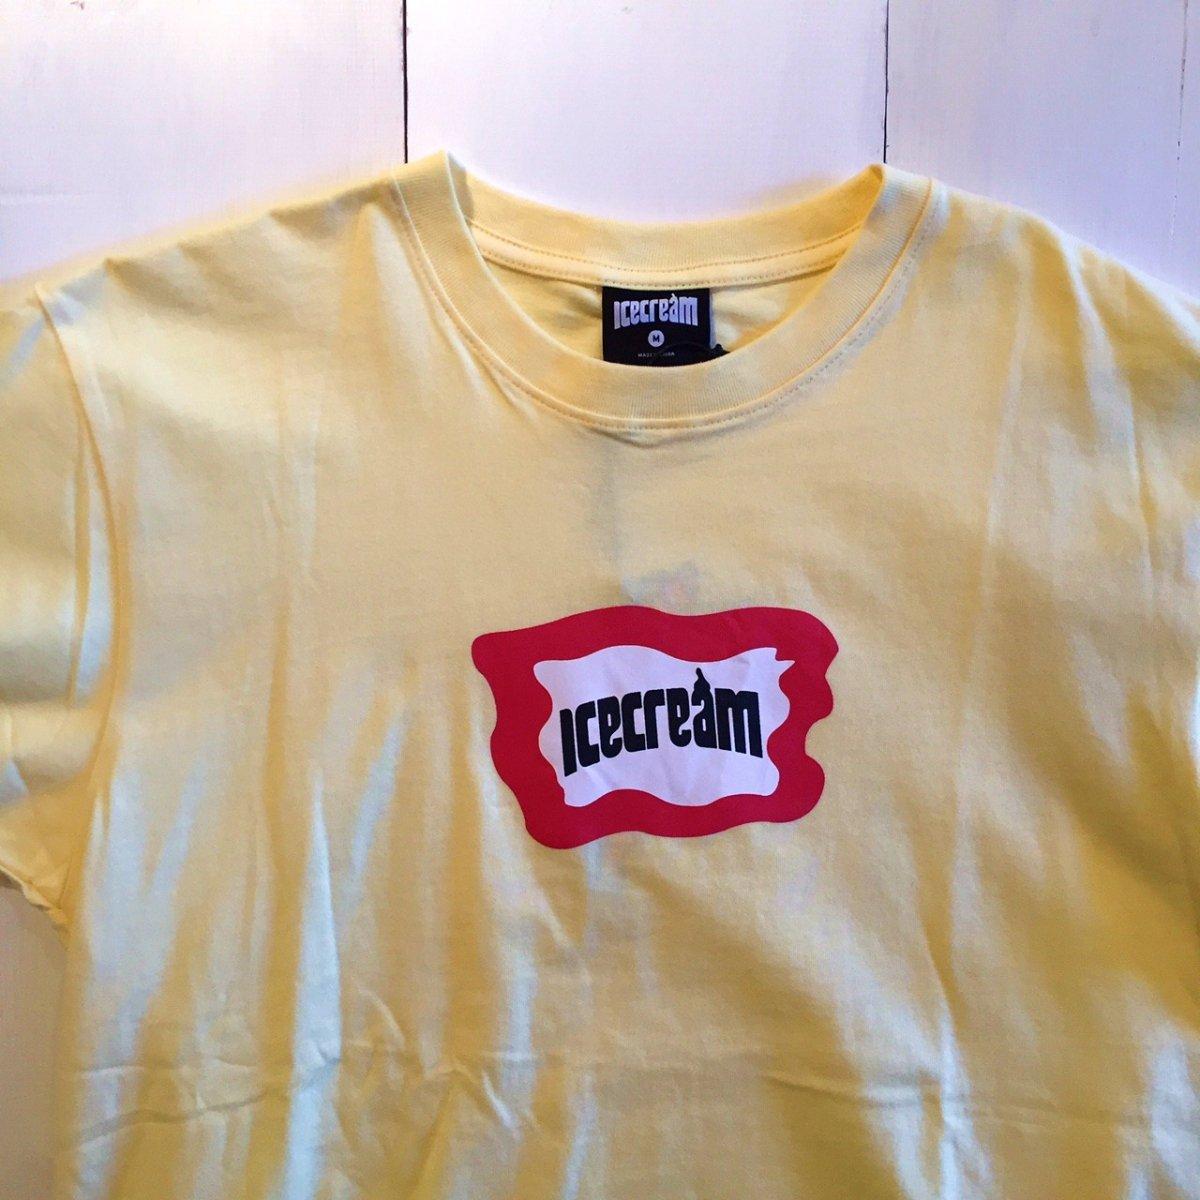 <img class='new_mark_img1' src='https://img.shop-pro.jp/img/new/icons3.gif' style='border:none;display:inline;margin:0px;padding:0px;width:auto;' />ICE CREAM アイスクリーム / Tシャツ MALTO T-SHIRTS 【YELLOW】